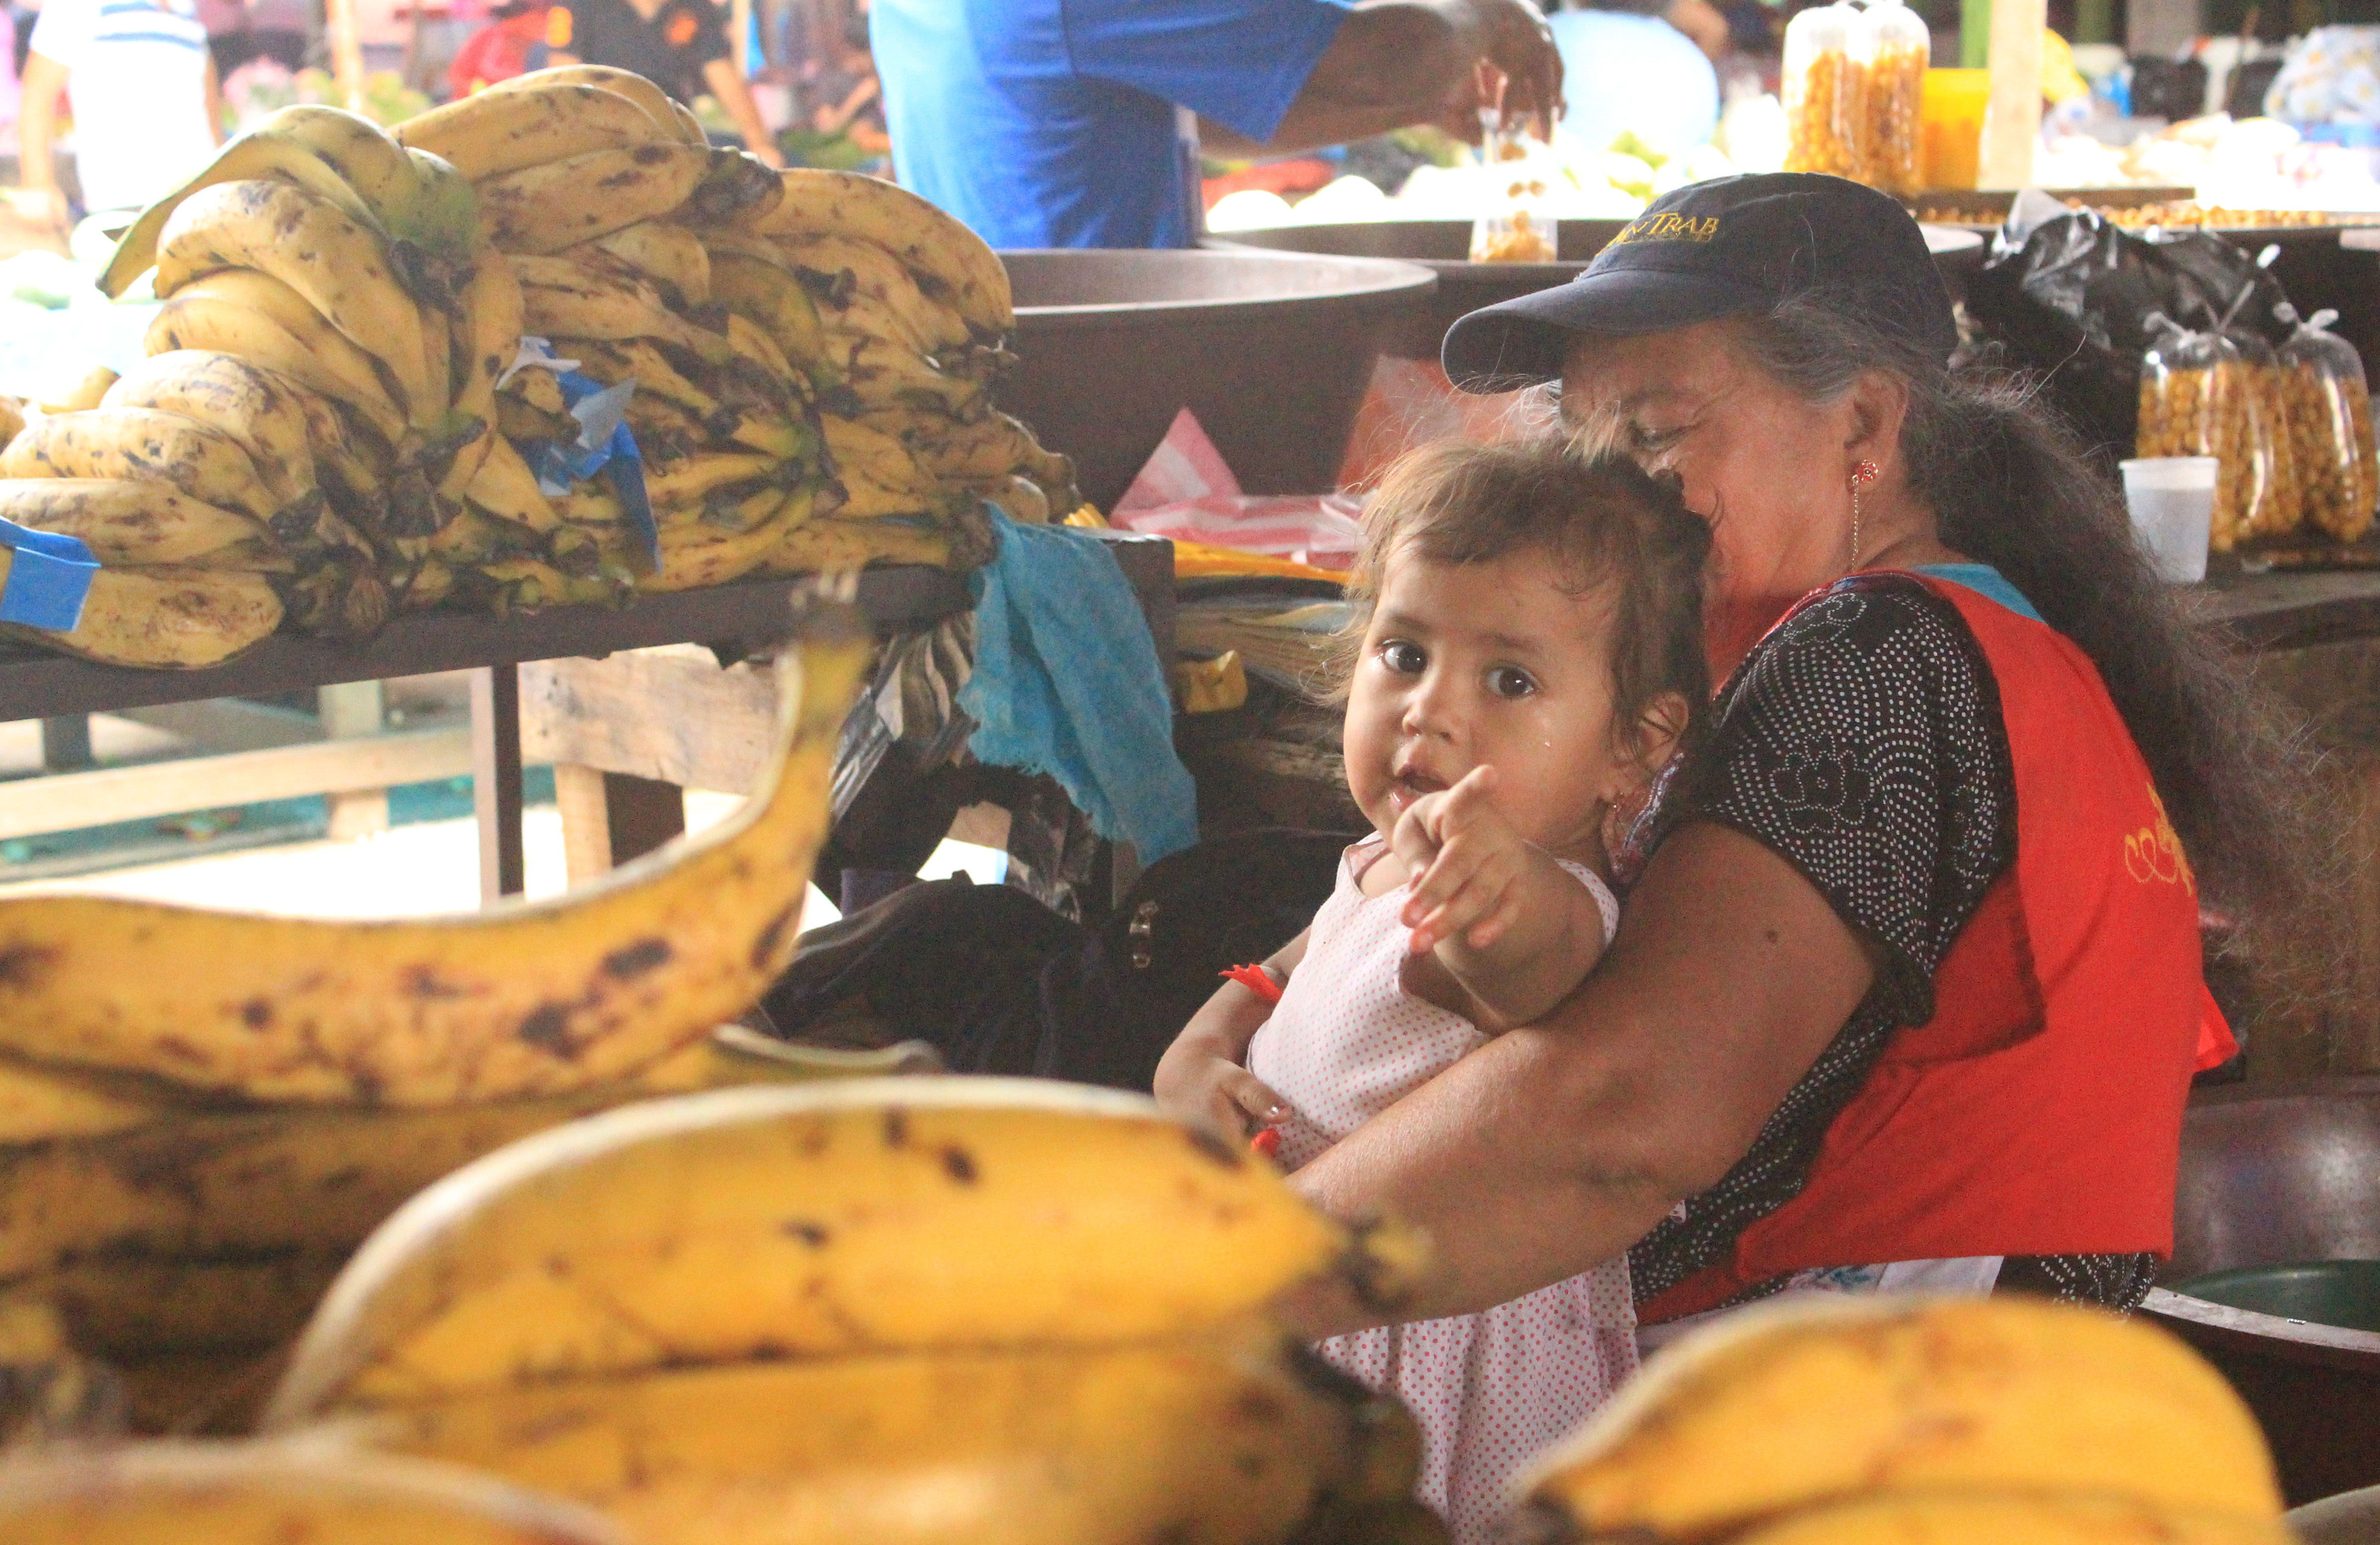 A toddler in El Mayoreo, Tegucigalpa's farmers market. (María José Burgos/CBC)